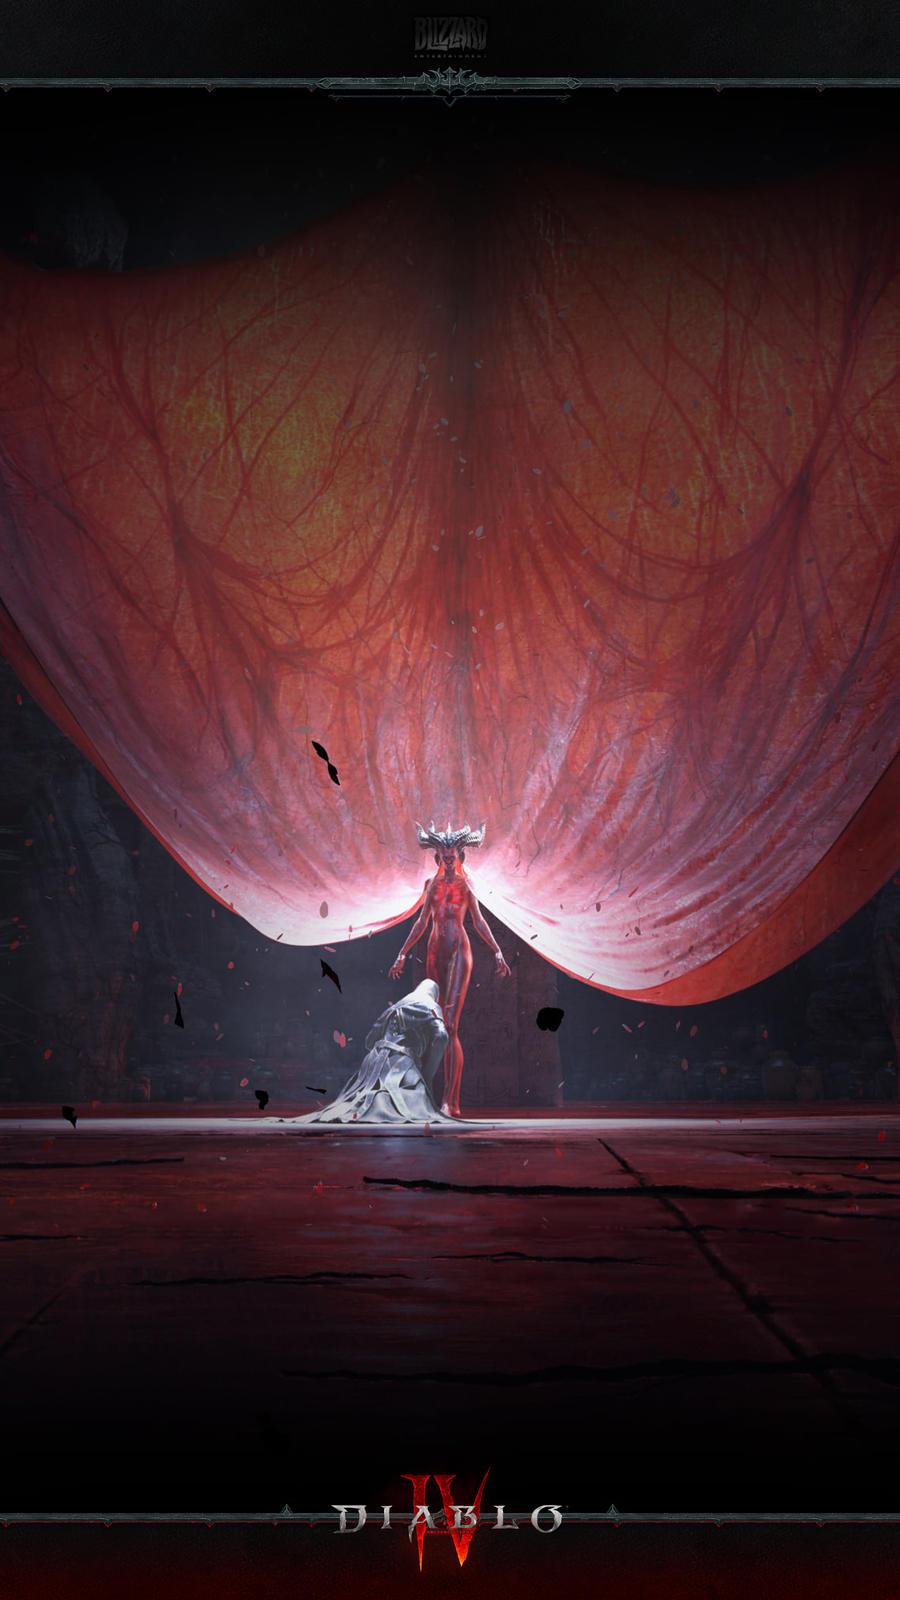 Diablo IV Mobile #2: Lilith II